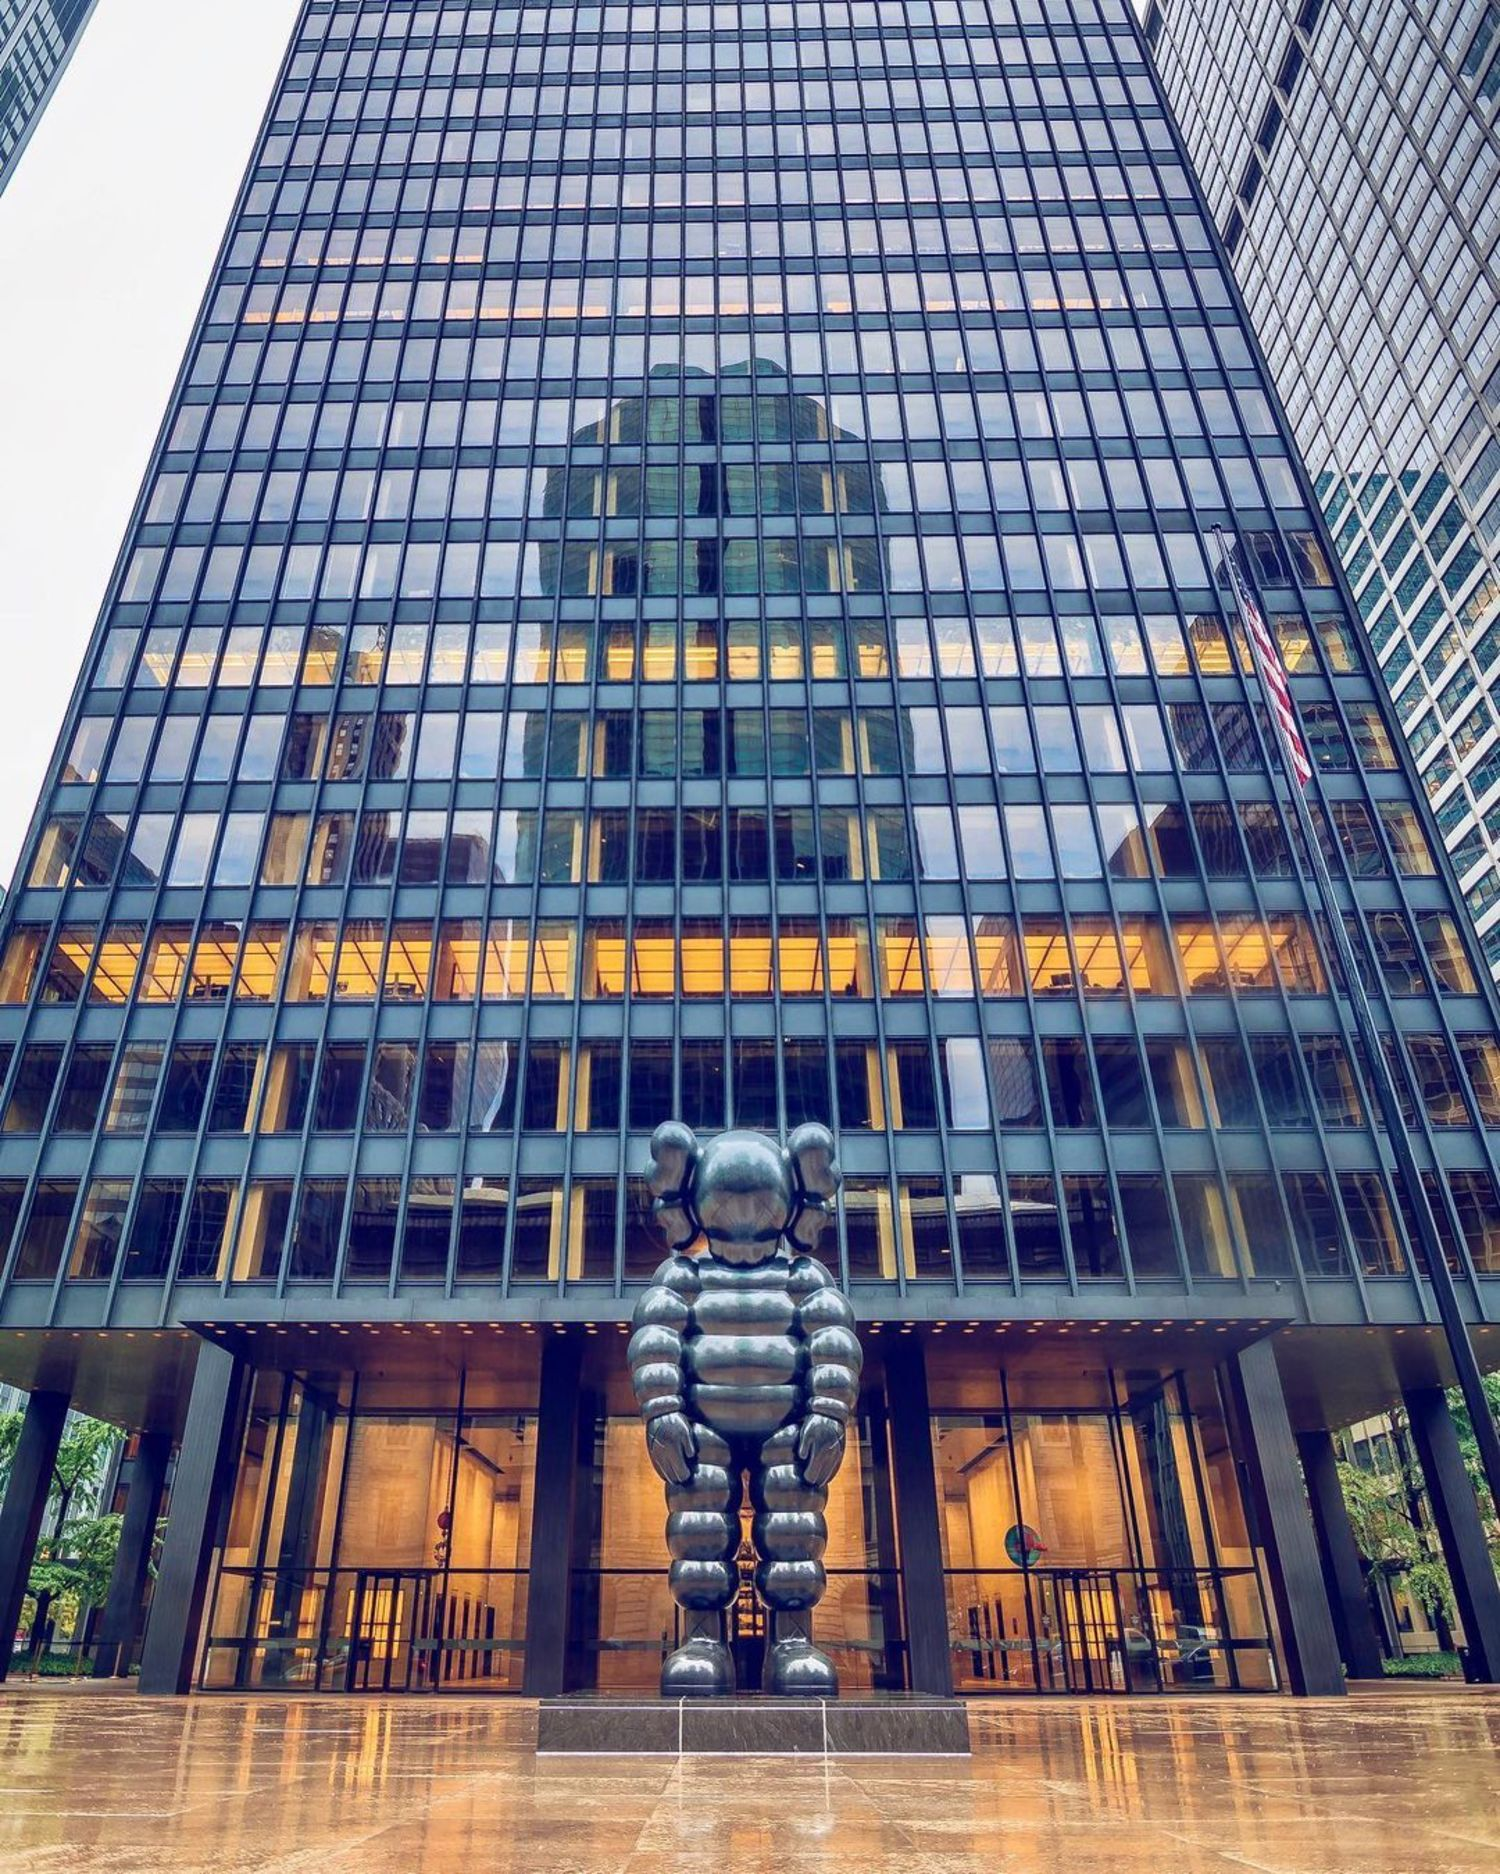 Seagram Building, Park Avenue, Midtown East. Manhattan